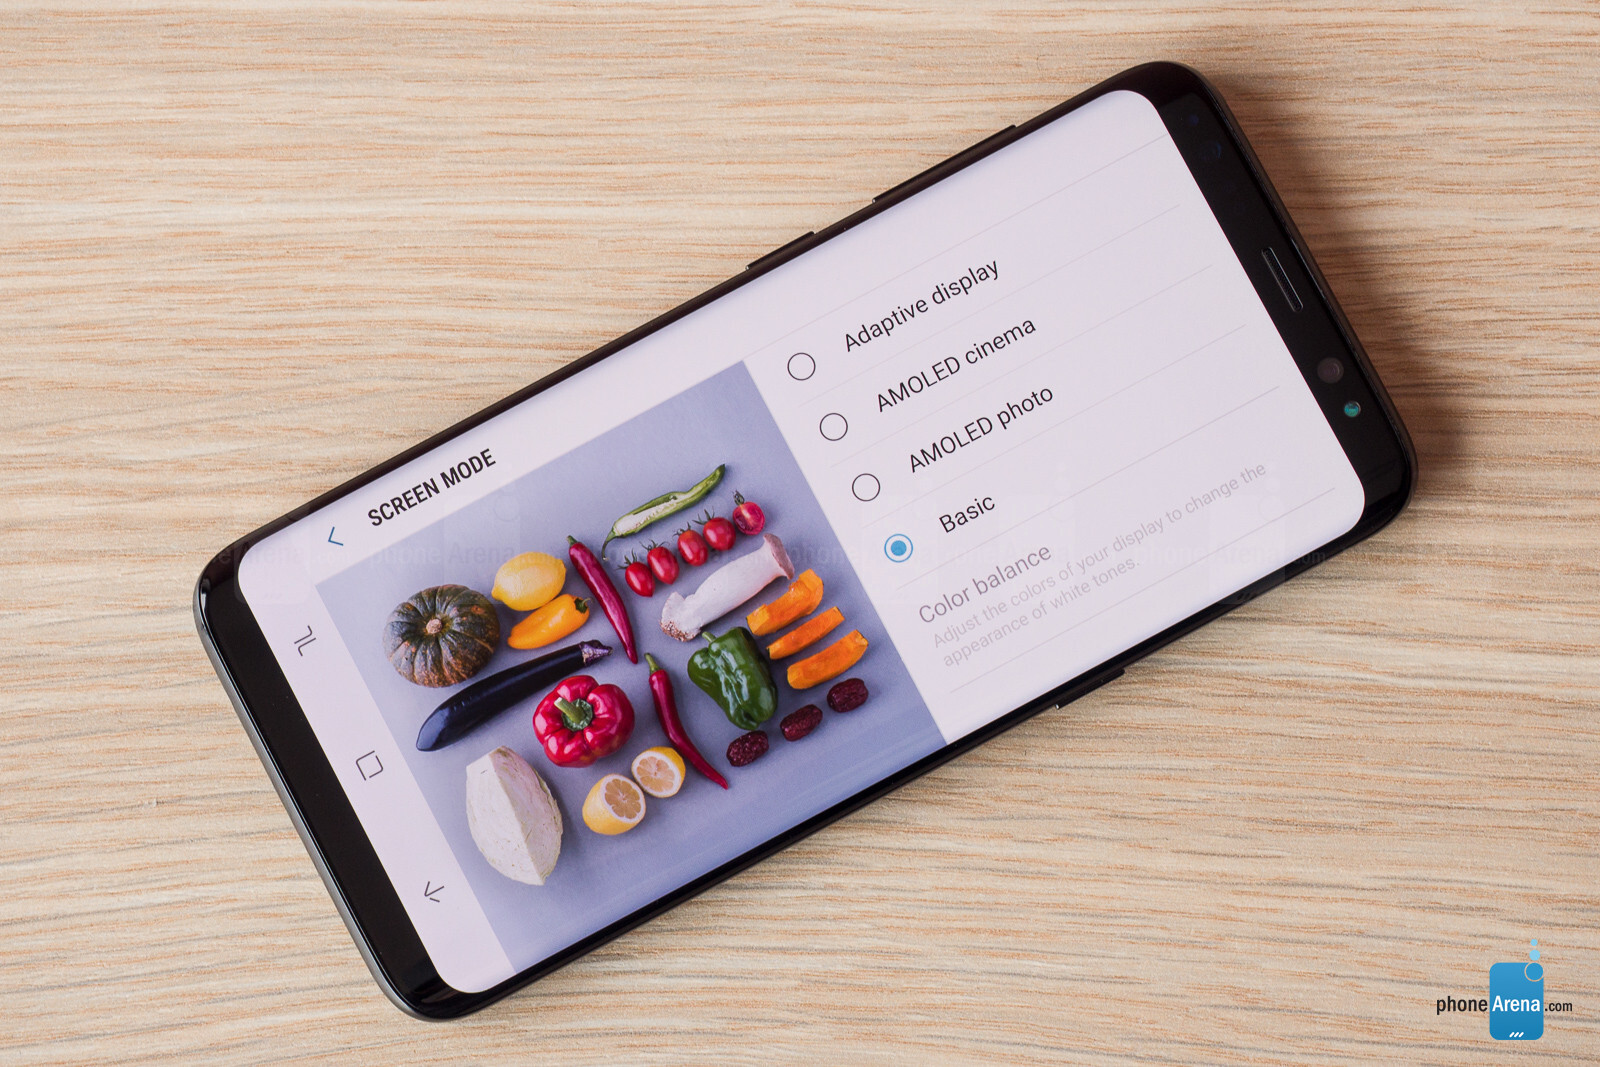 Samsung Galaxy S8 Review - PhoneArena